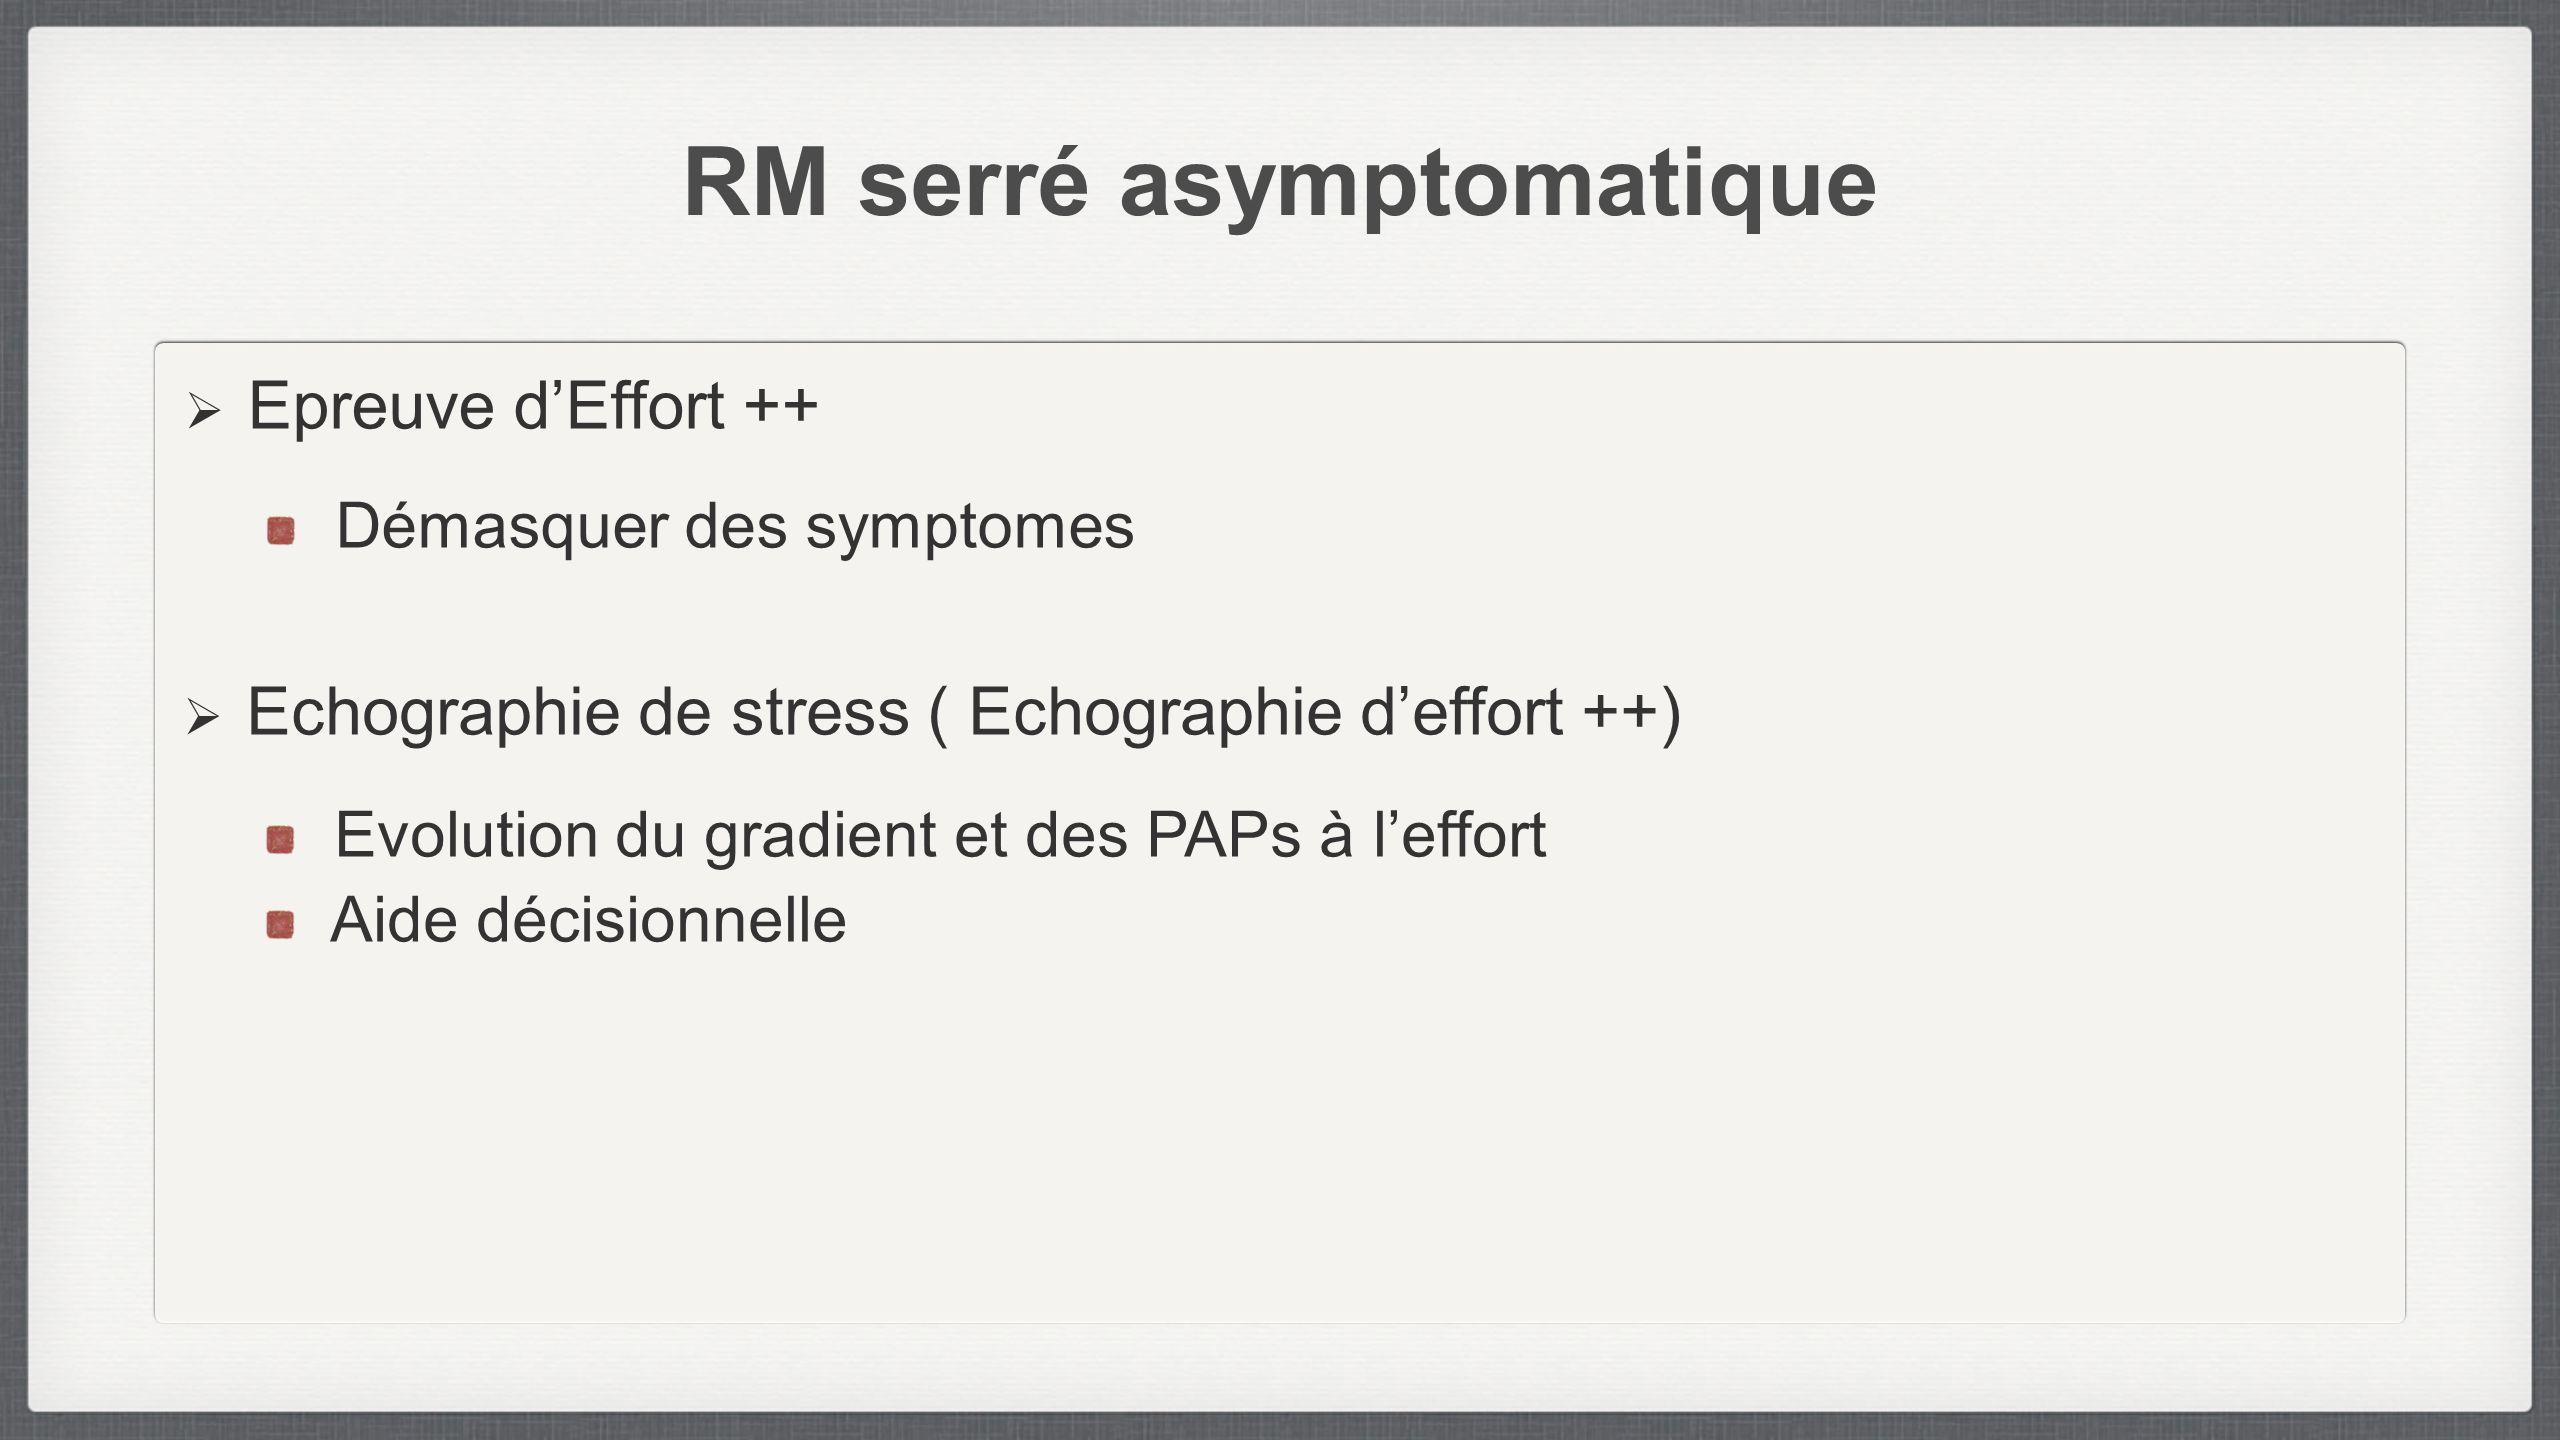 RM serré asymptomatique